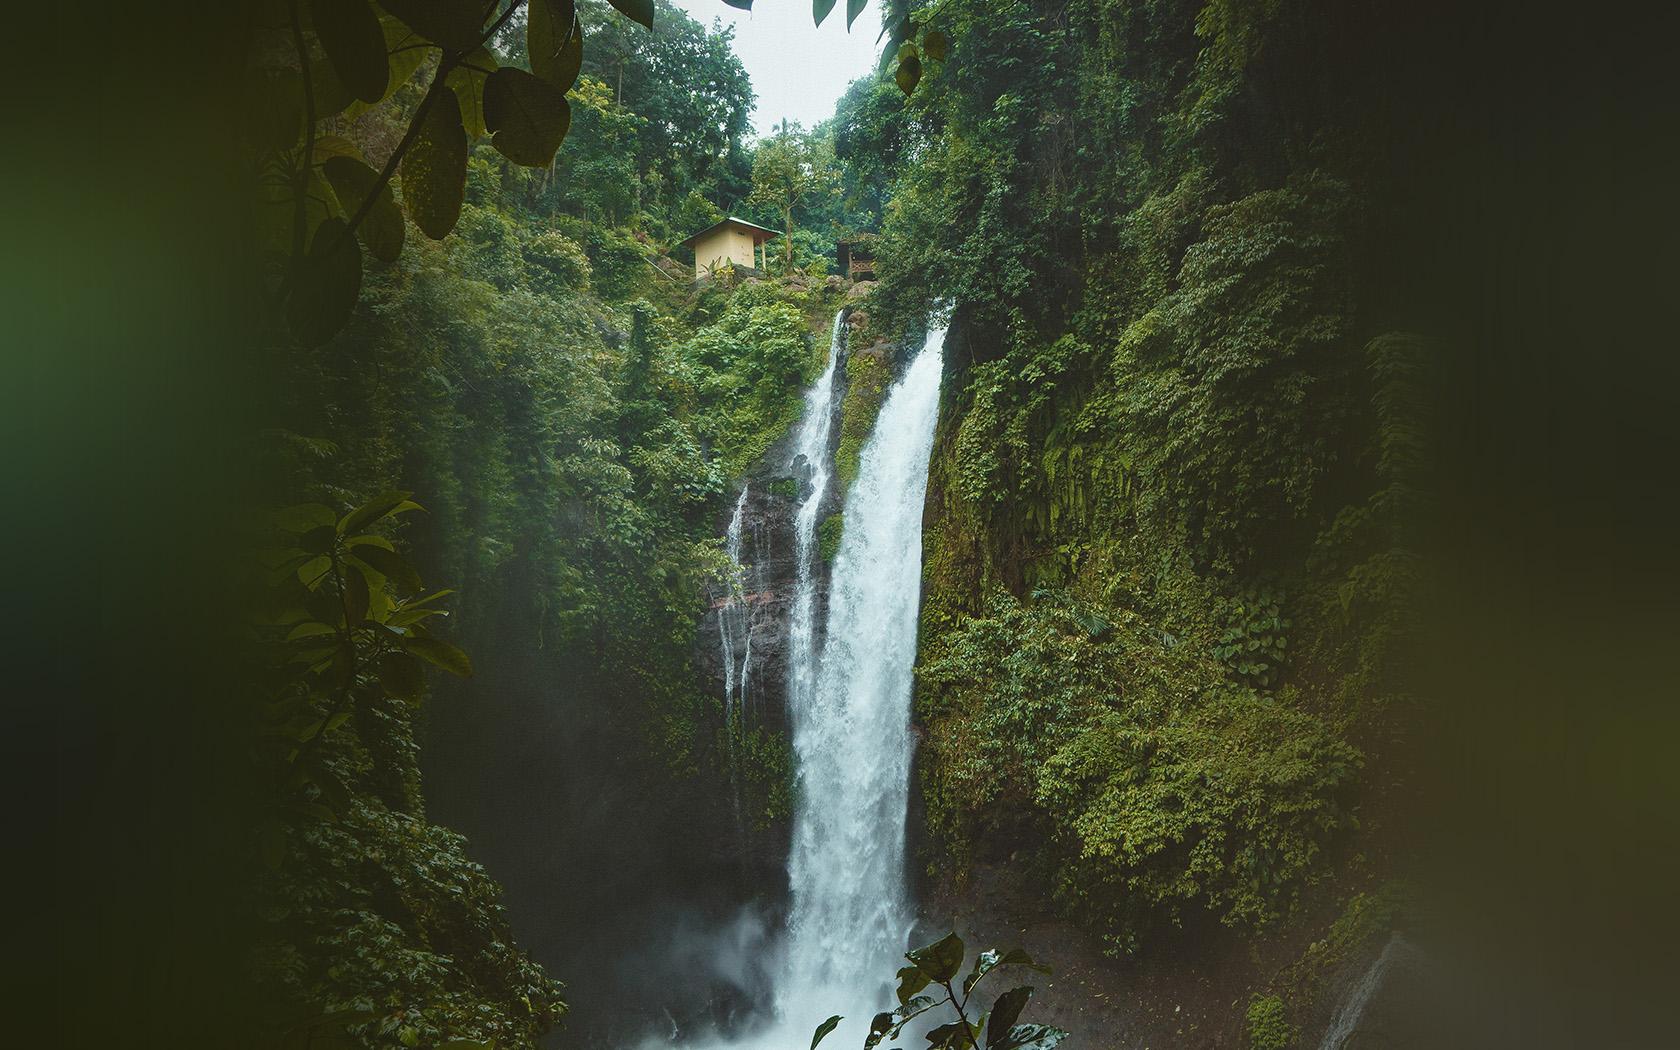 nx66-mountain-waterfall-summer-amazon-nature-wallpaper